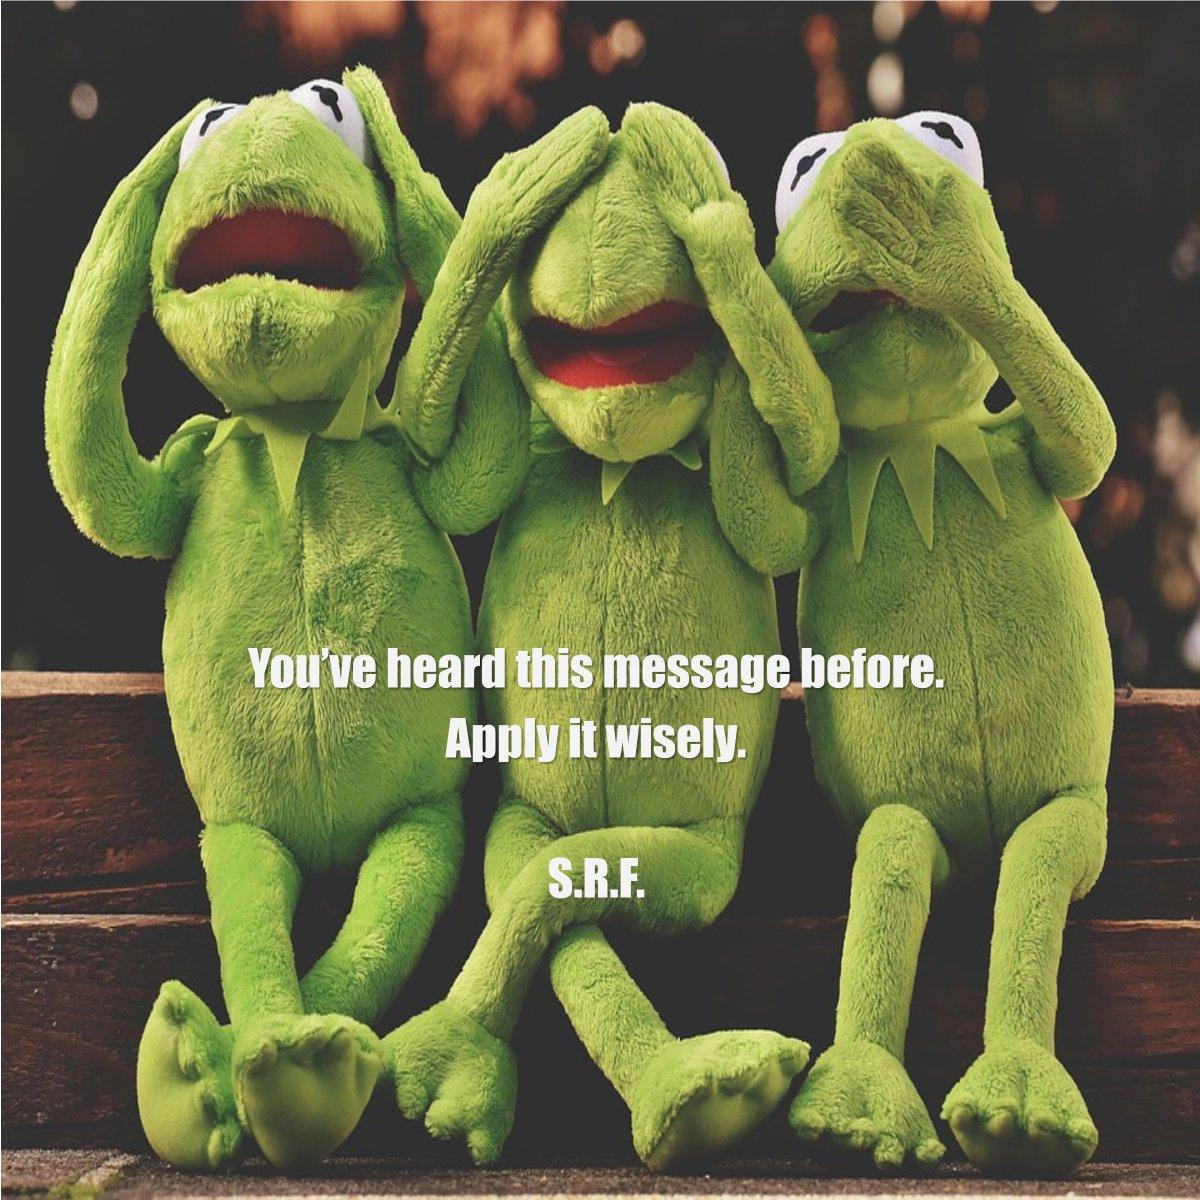 Thanks for the reminder, Kermit. ~ S.R.F. #letstalkaboutfaith https://faithishowwelive.blogspot.com/2019/…/use-wisdom.html